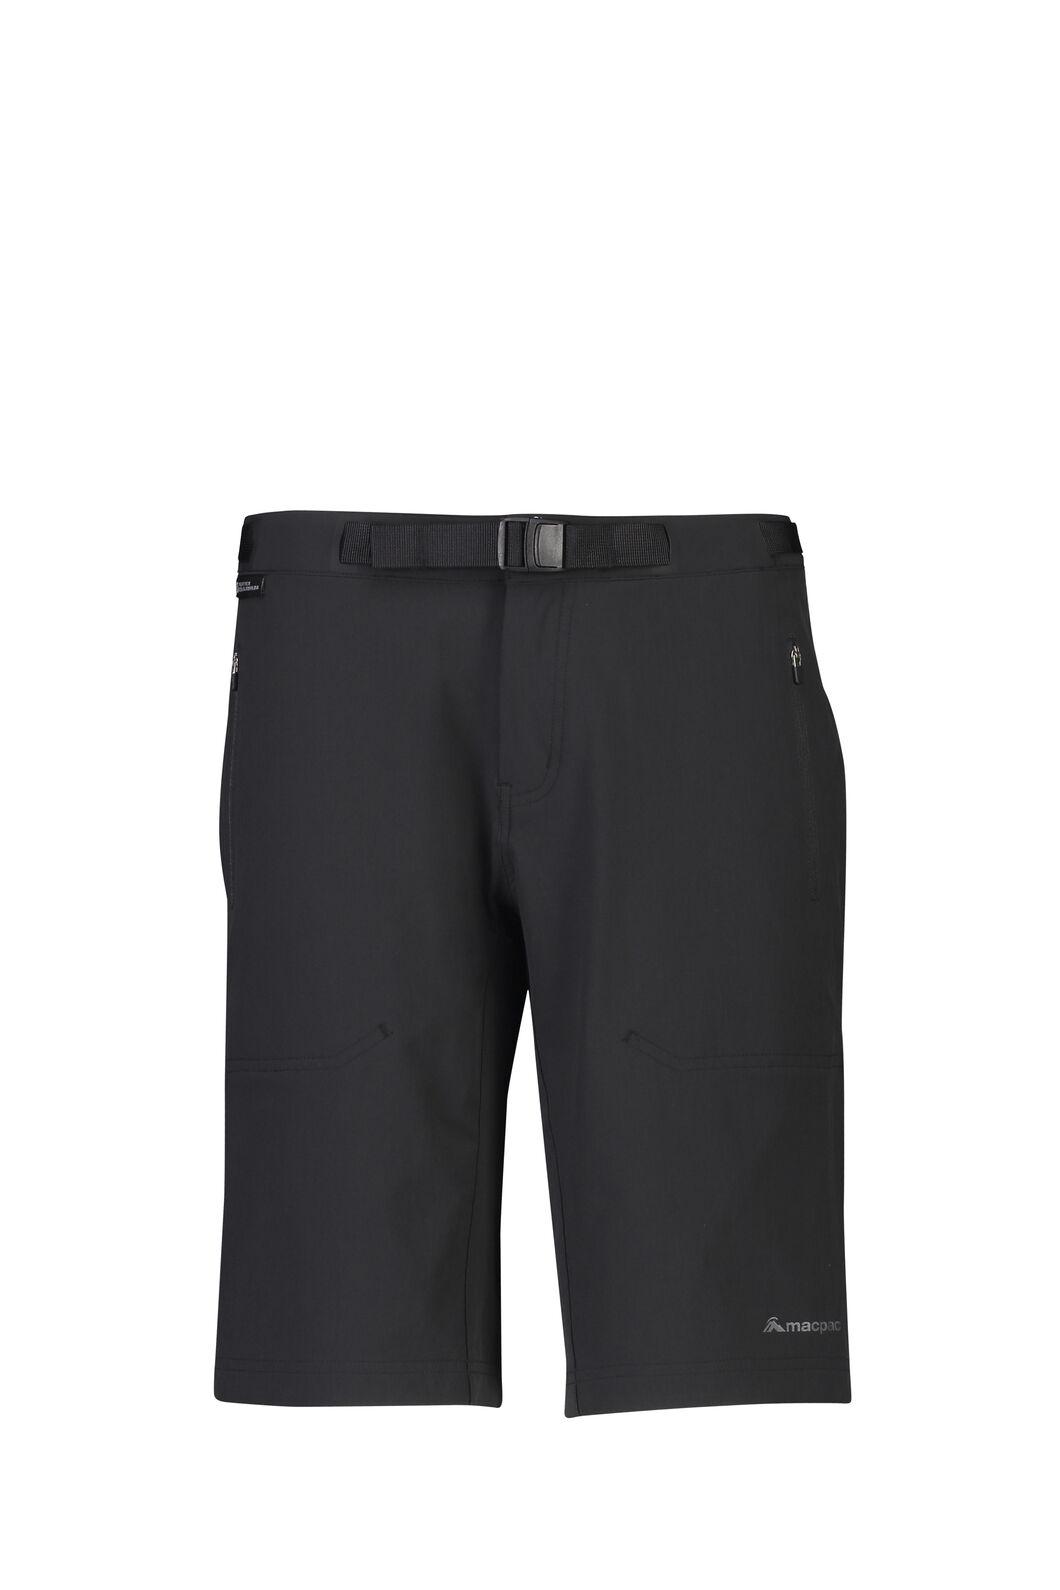 Macpac Women's Trekker Pertex® Equilibrium Softshell Shorts, Black, hi-res